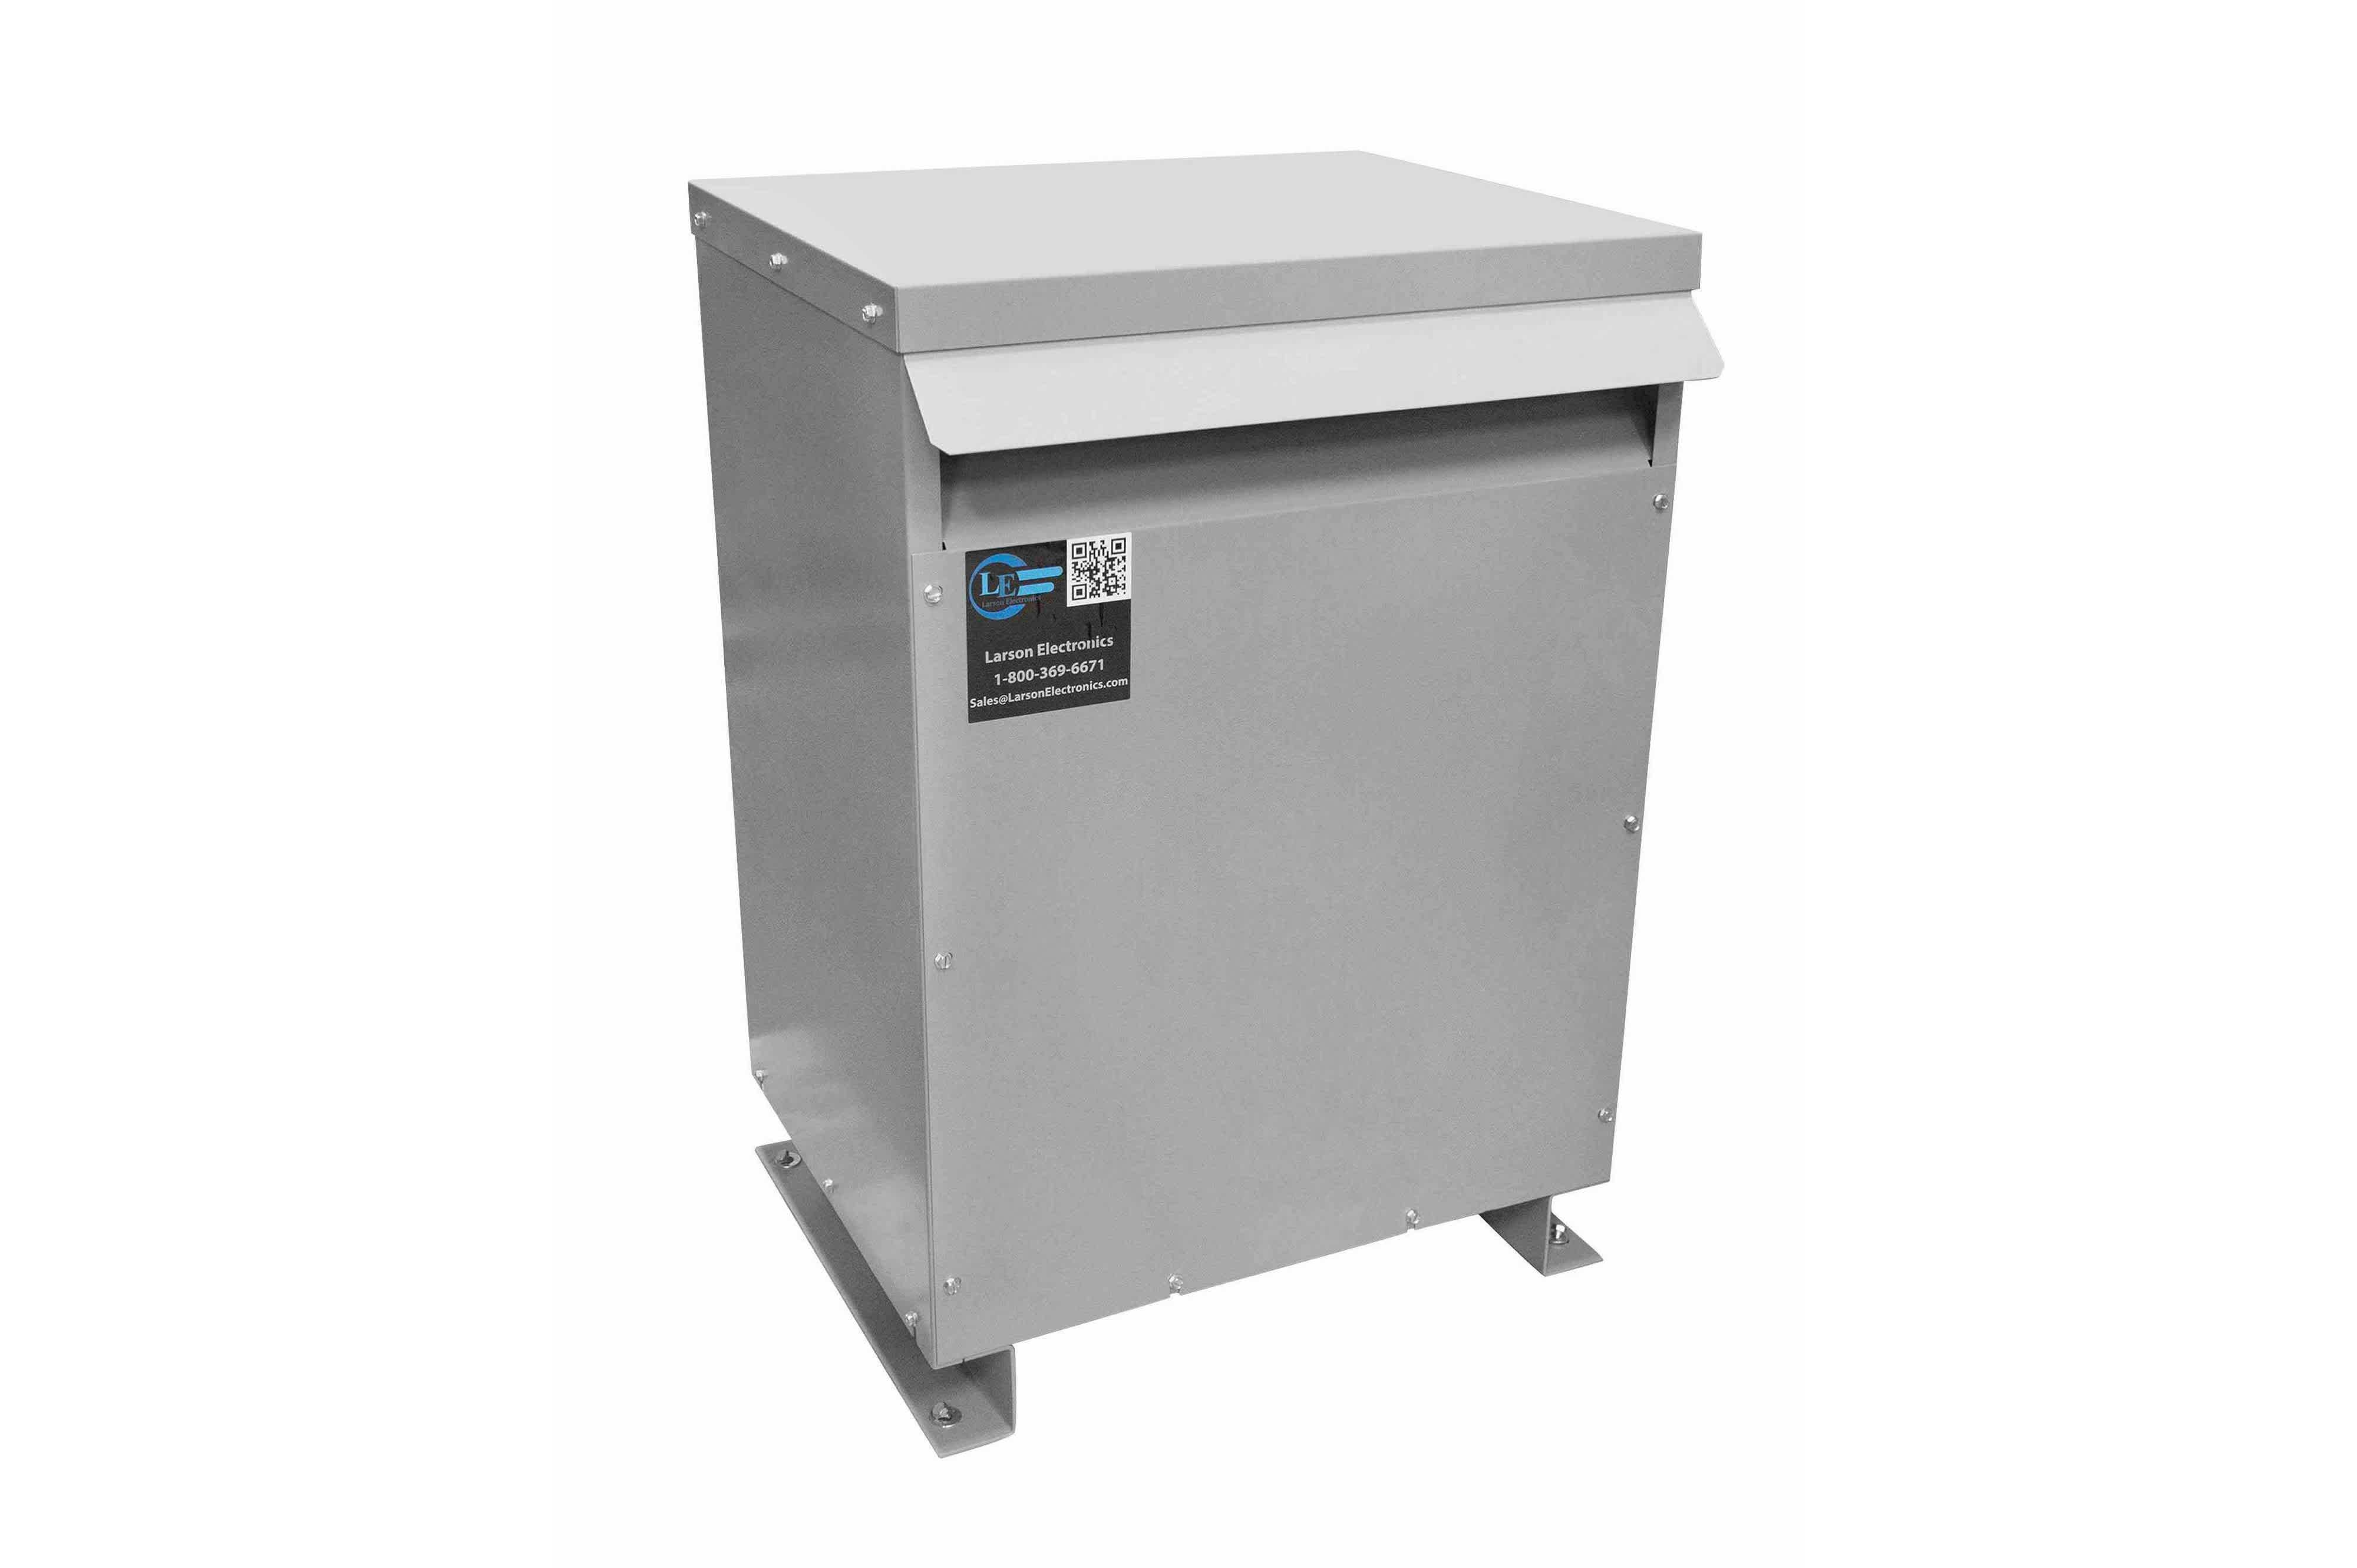 900 kVA 3PH Isolation Transformer, 600V Wye Primary, 415Y/240 Wye-N Secondary, N3R, Ventilated, 60 Hz